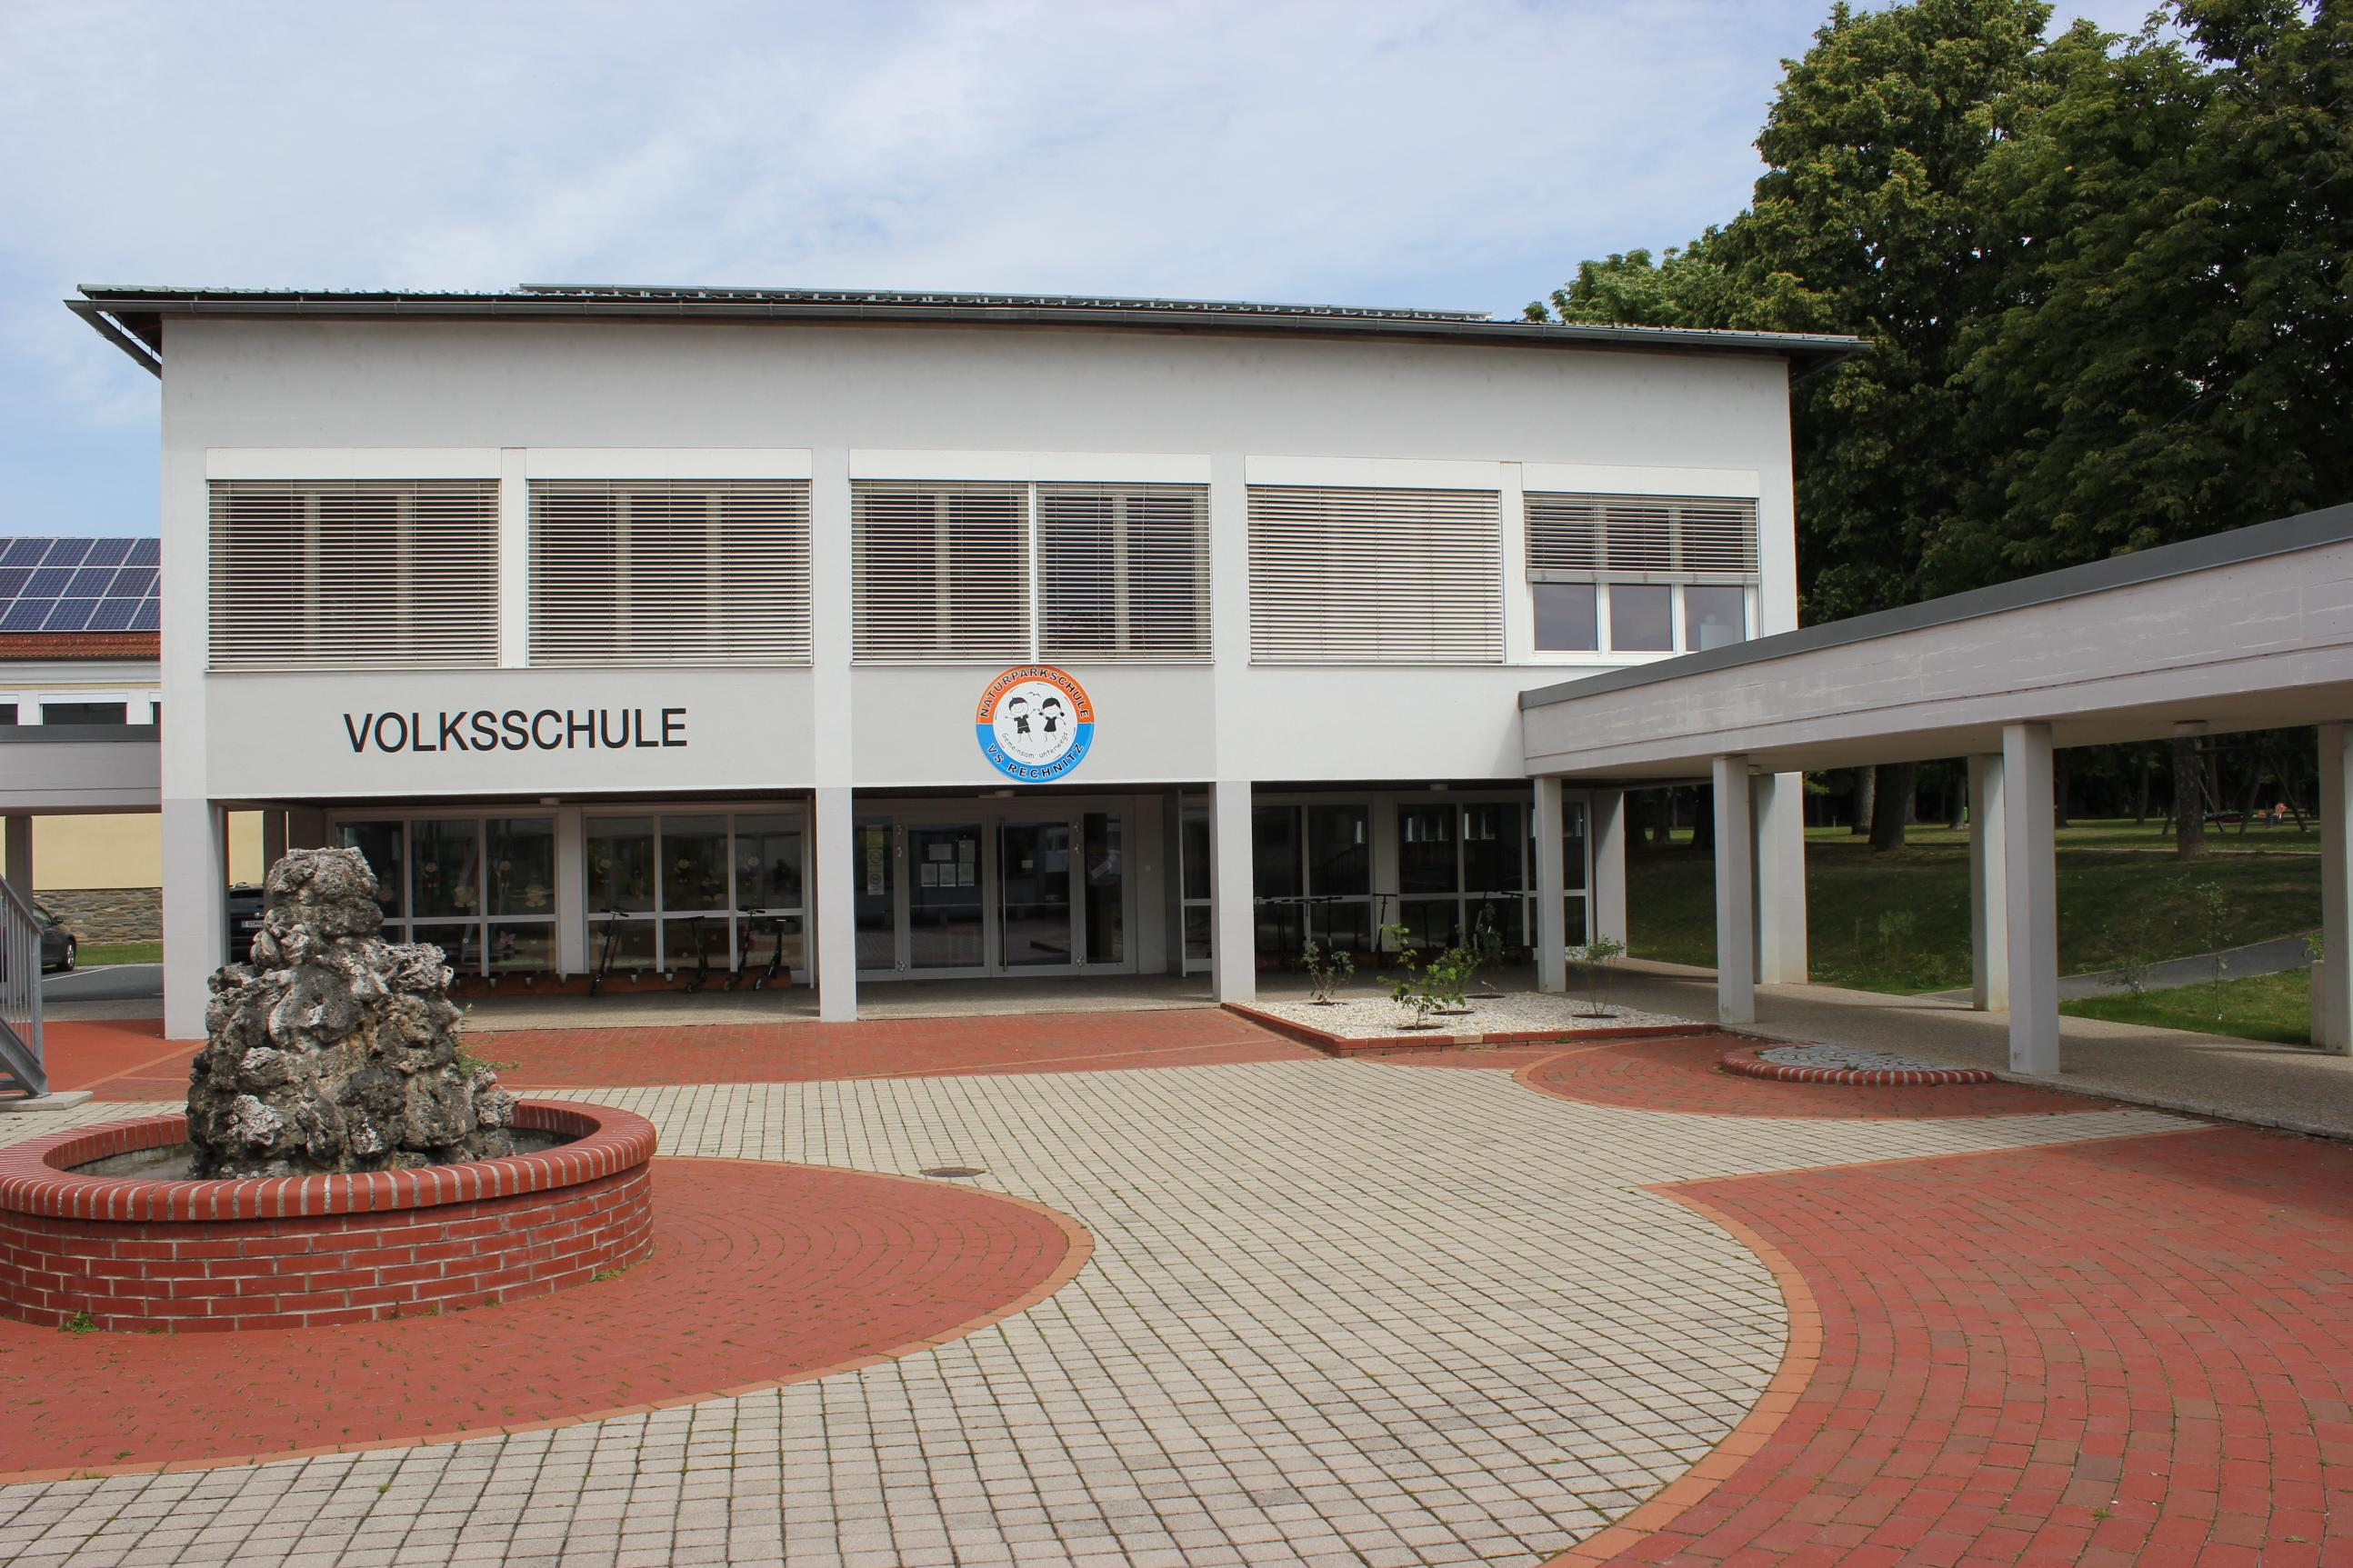 VS-Rechnitz, Südburgenland